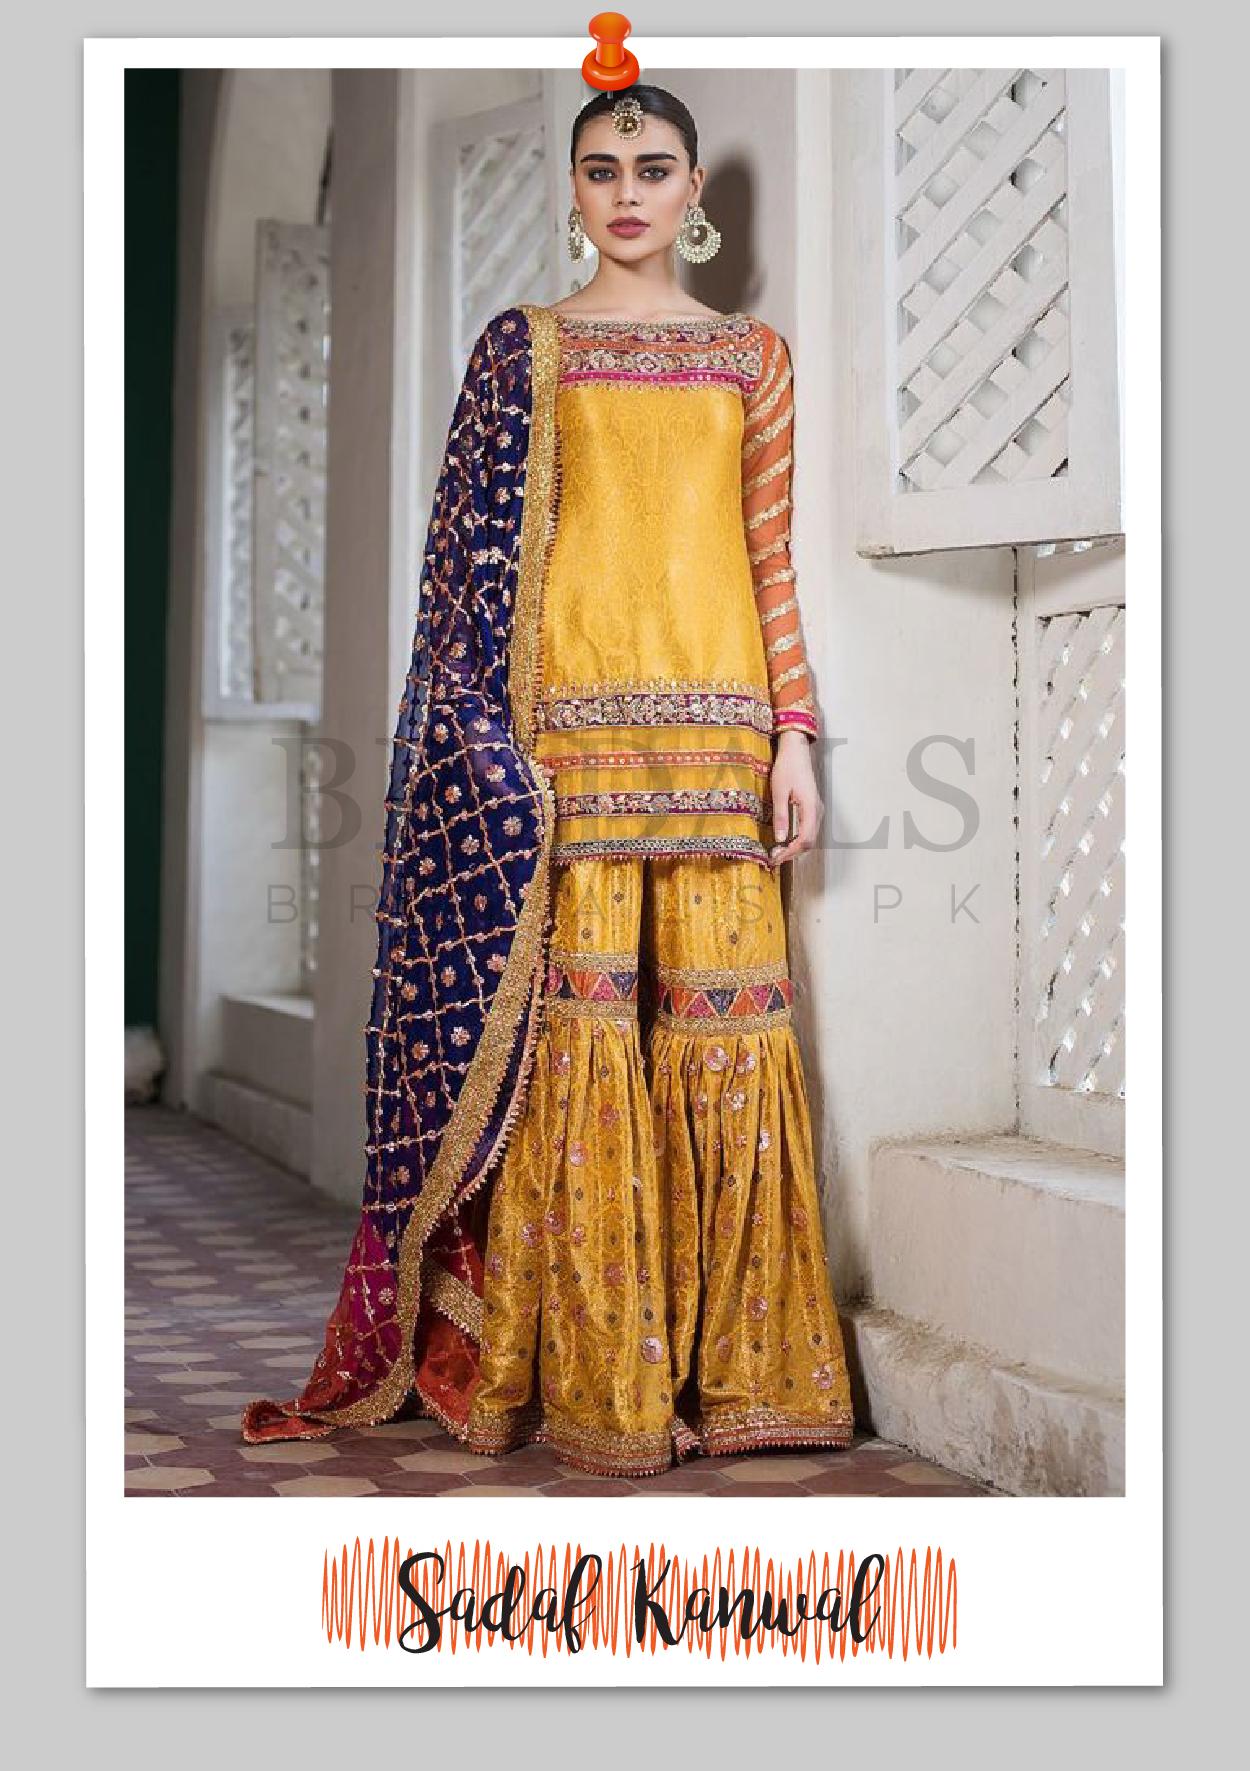 Sadaf Kanwal wears Zainab Chottani